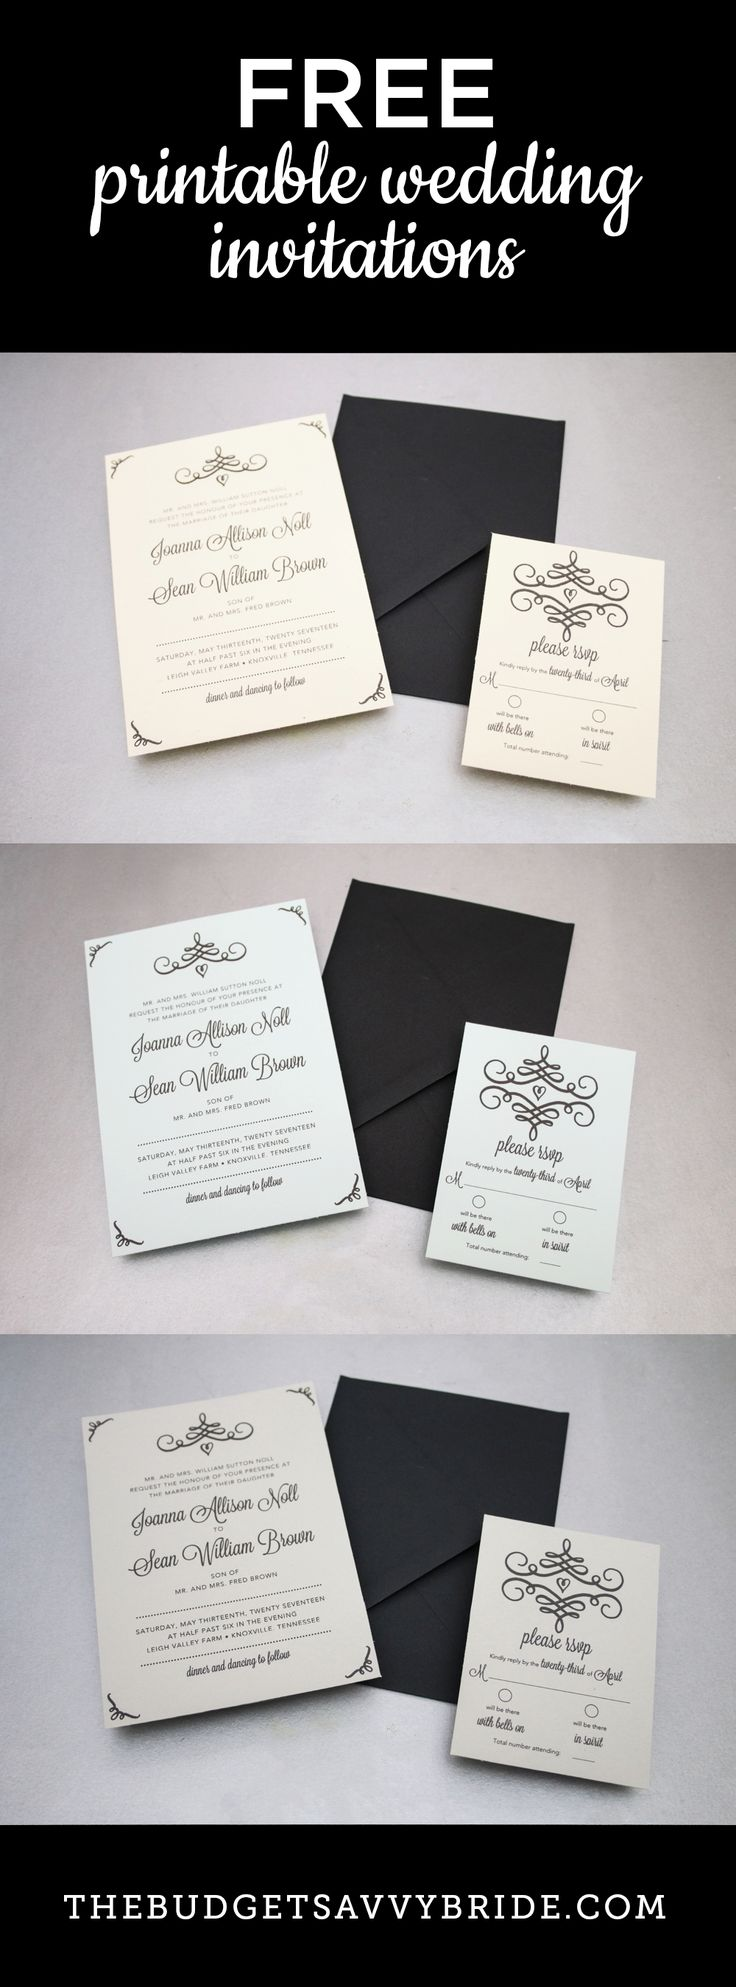 DIY Swirl Wedding Invitations Free Printable